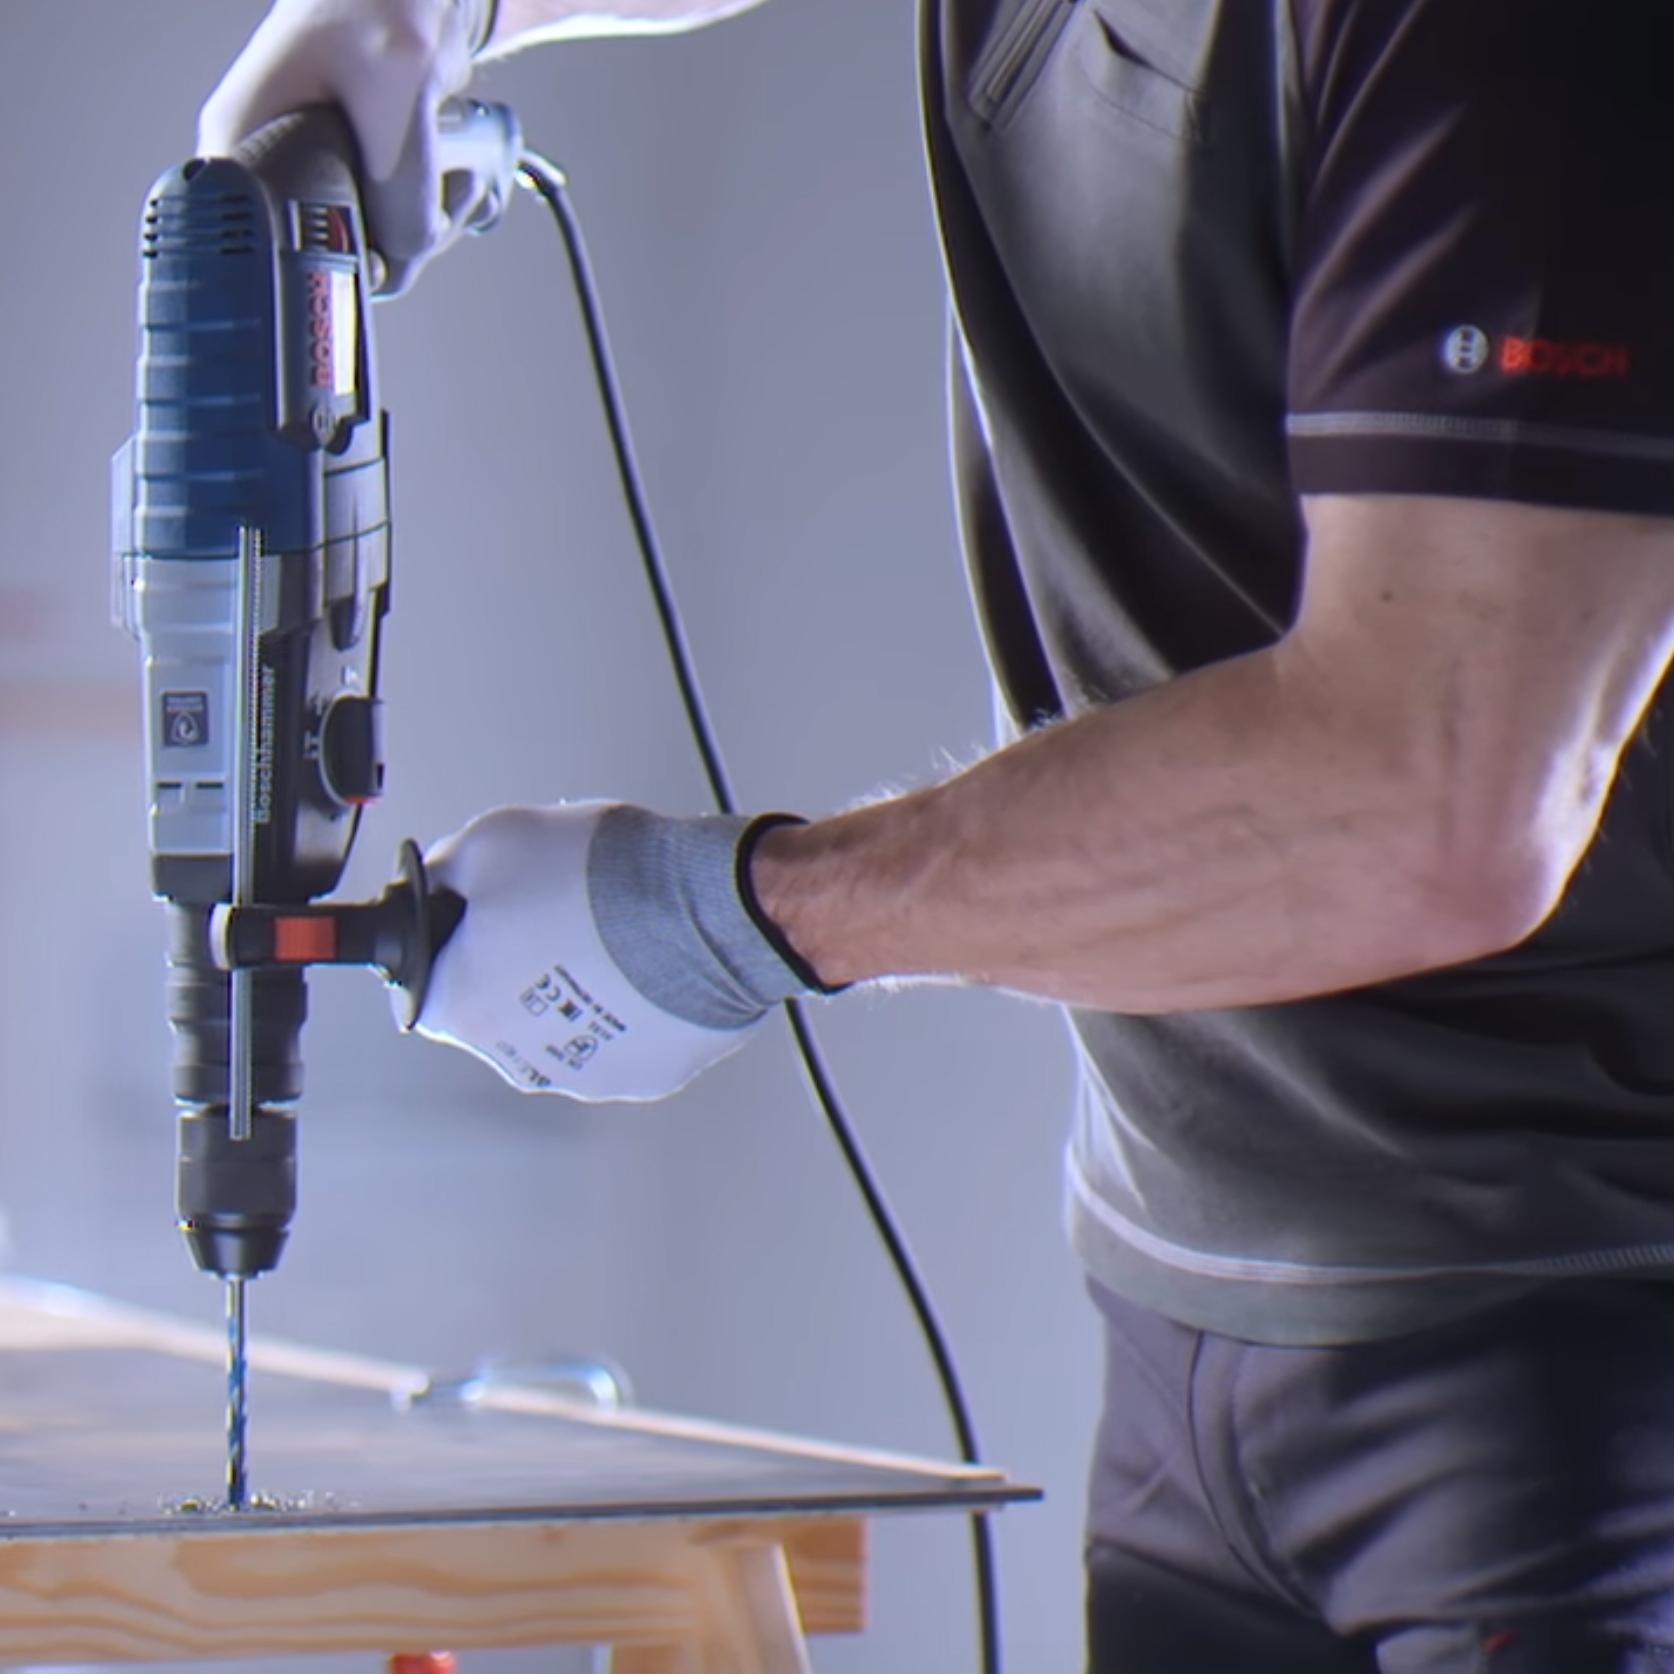 Bosch Professional GBH 2-28F Elektro-Bohr-/Meißelhammer inkl. Koffer + X5L Bohrersatz